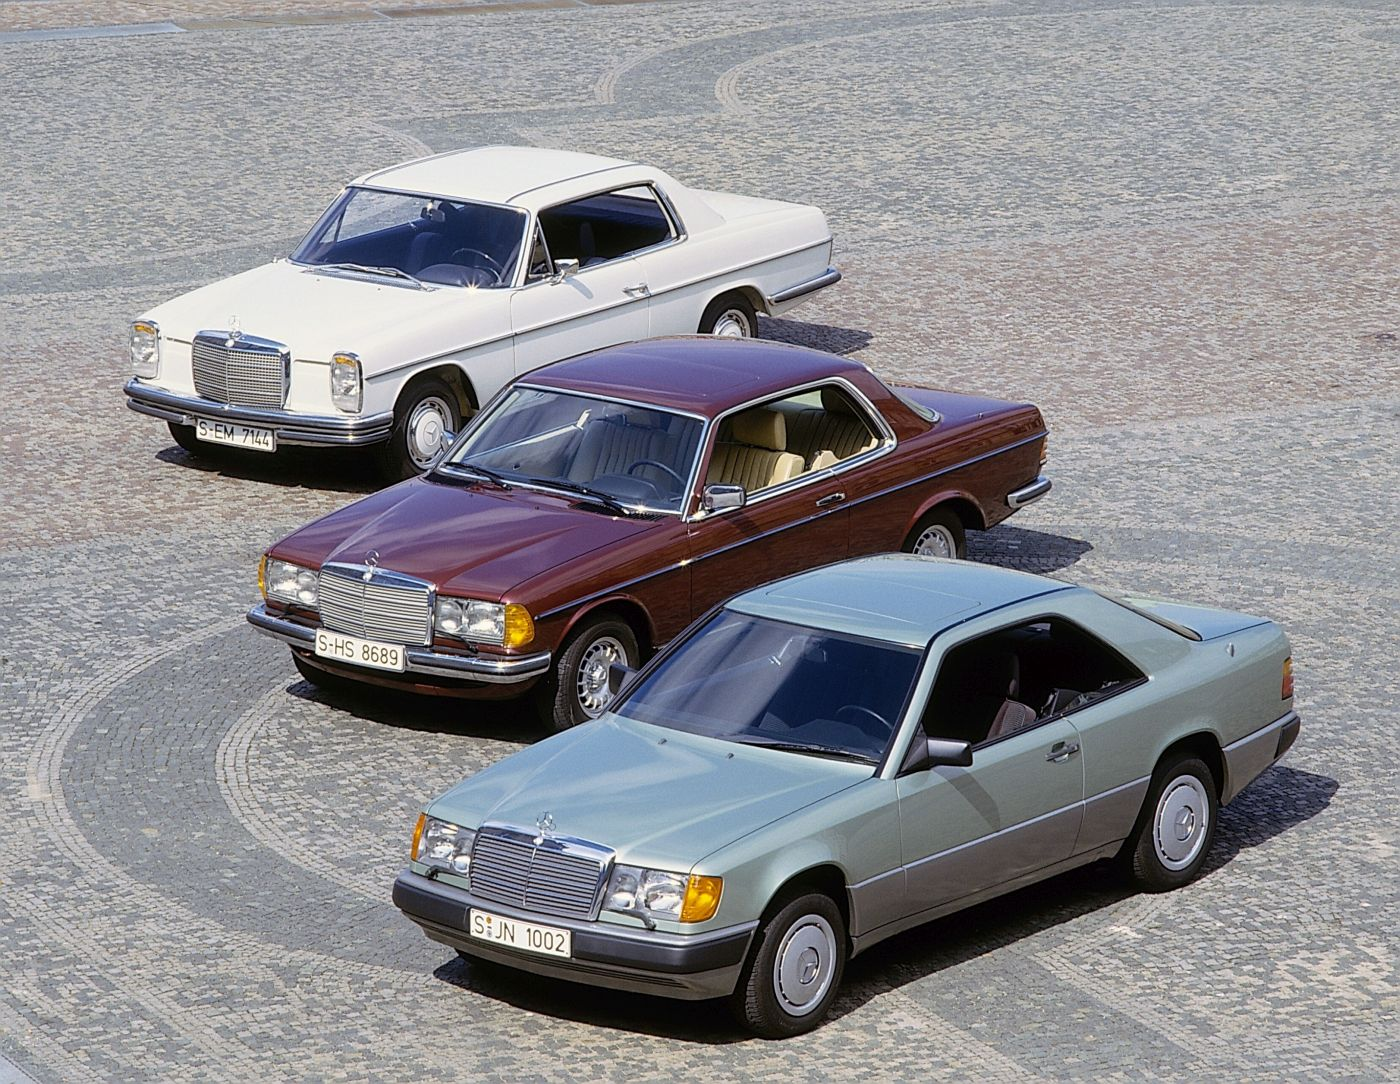 Mercedes-Benz C 124 123 Strich Acht Coupe (8)